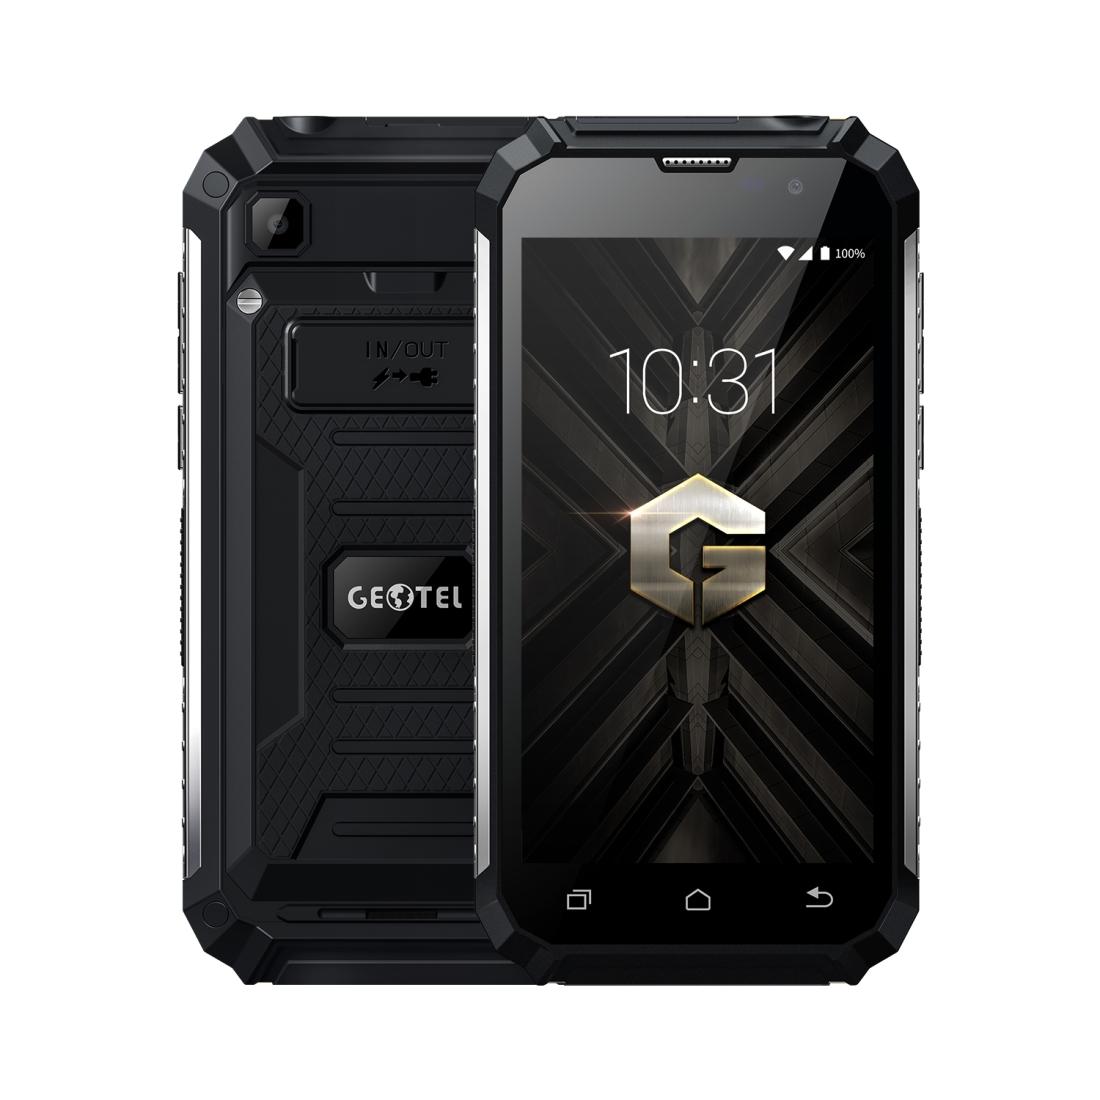 Geotel Geotel G1 CZ/SK, 2GB+16GB, černá